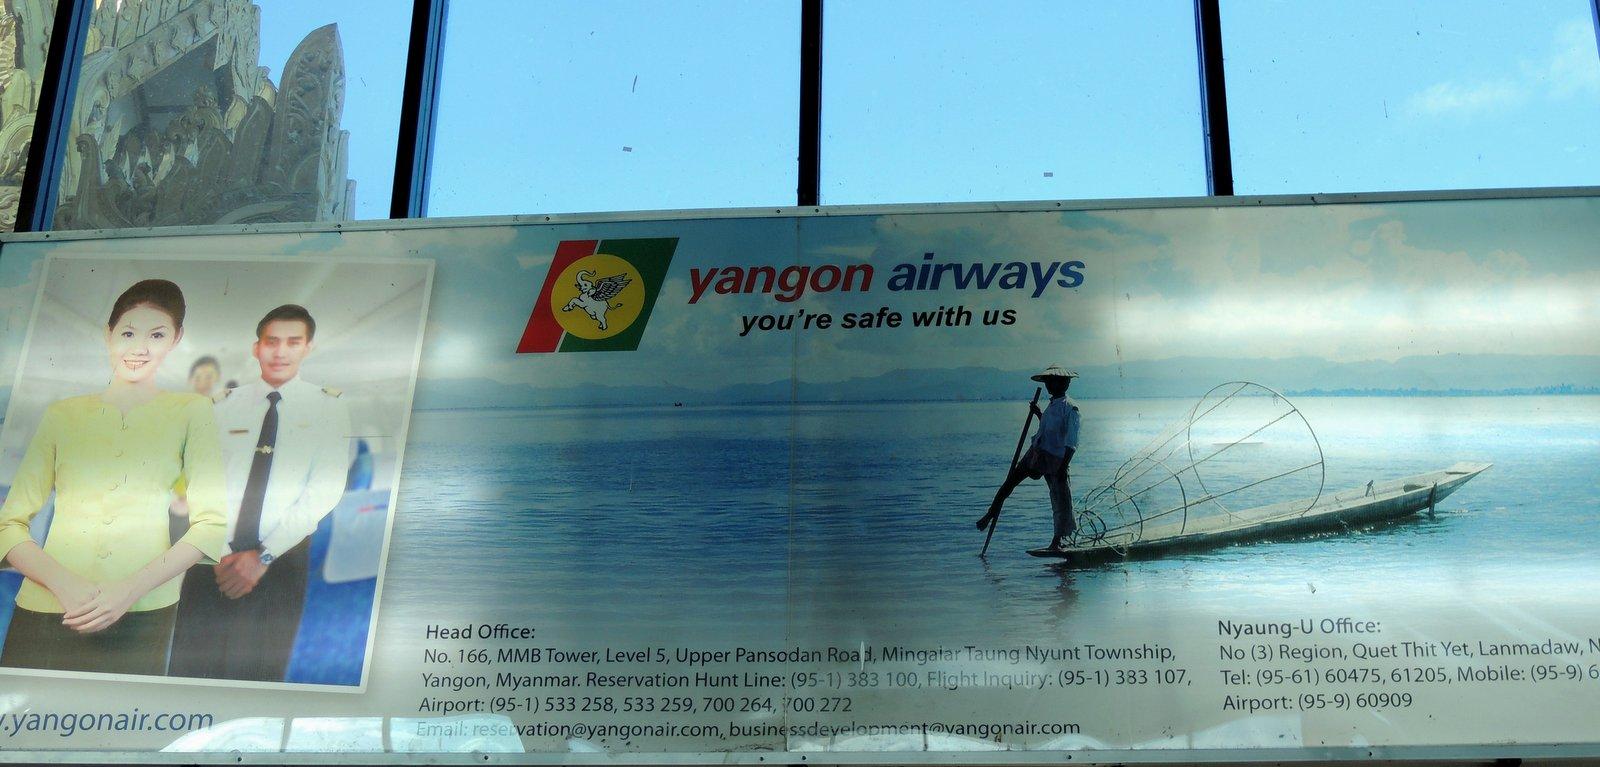 Am Flughafen in Nyaung U